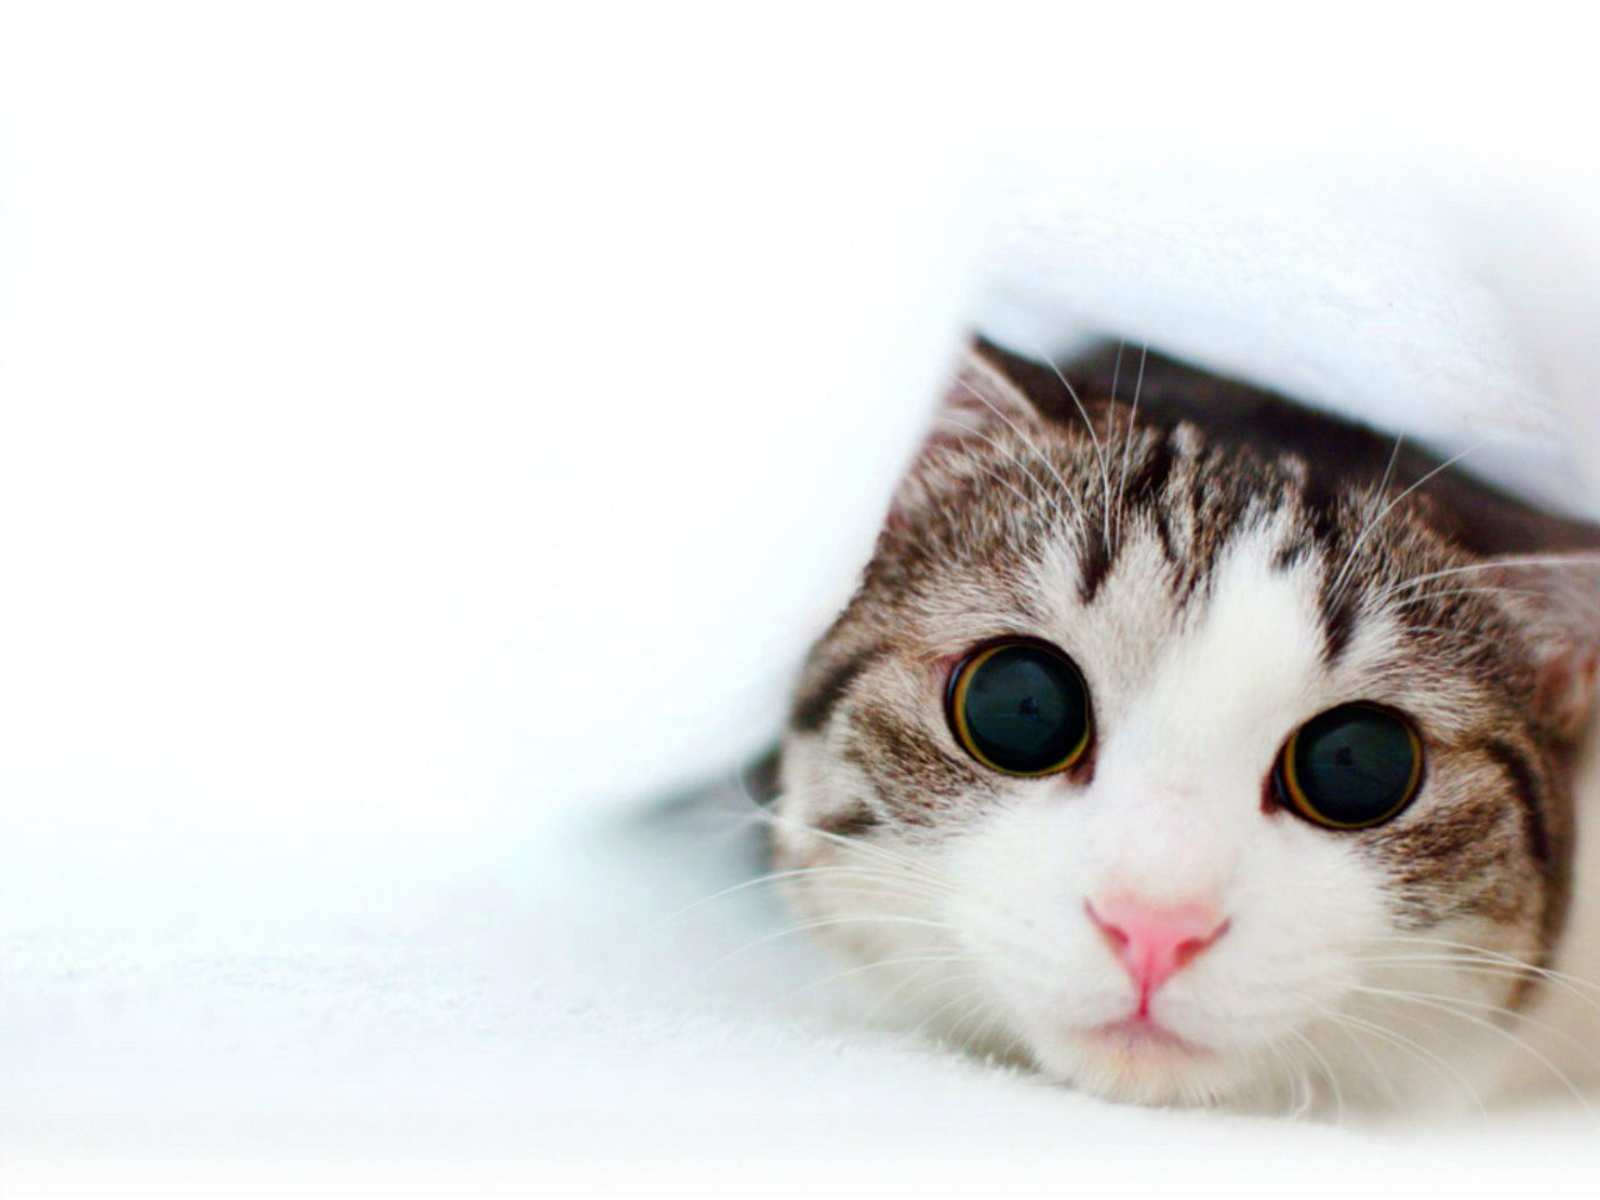 Cute kittens wallpaper google play store revenue download 1600x1200 thecheapjerseys Gallery